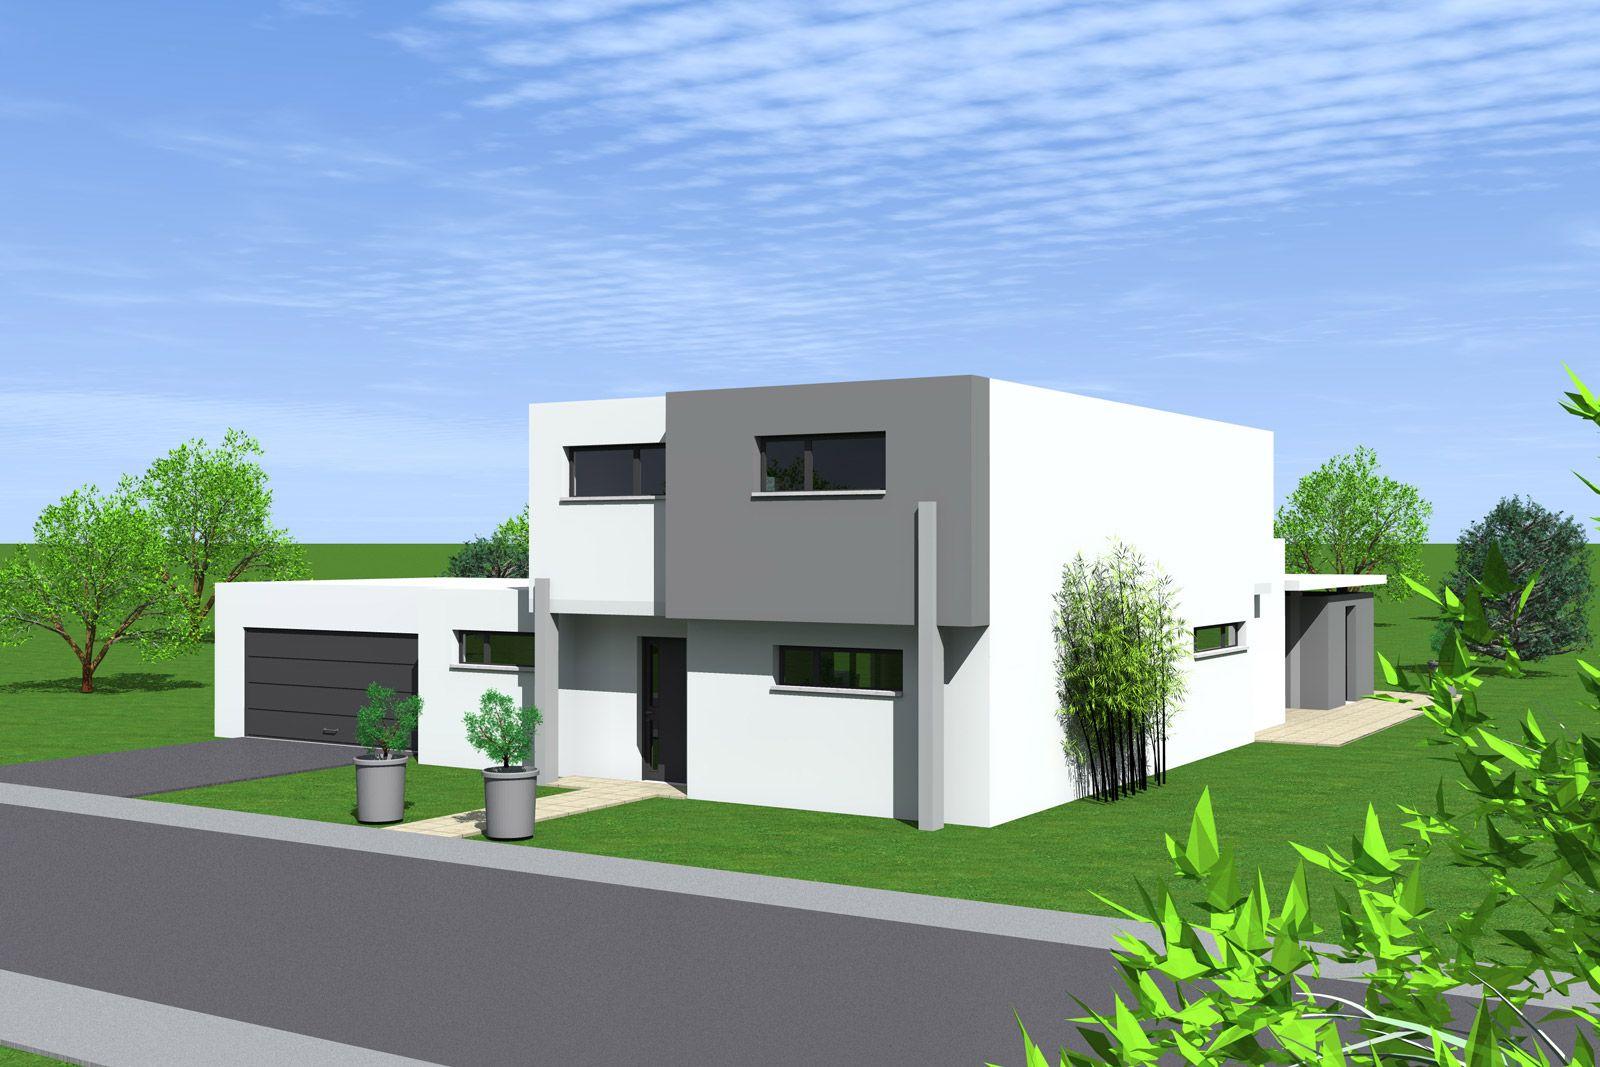 cube-house-170-vue1-1.jpg